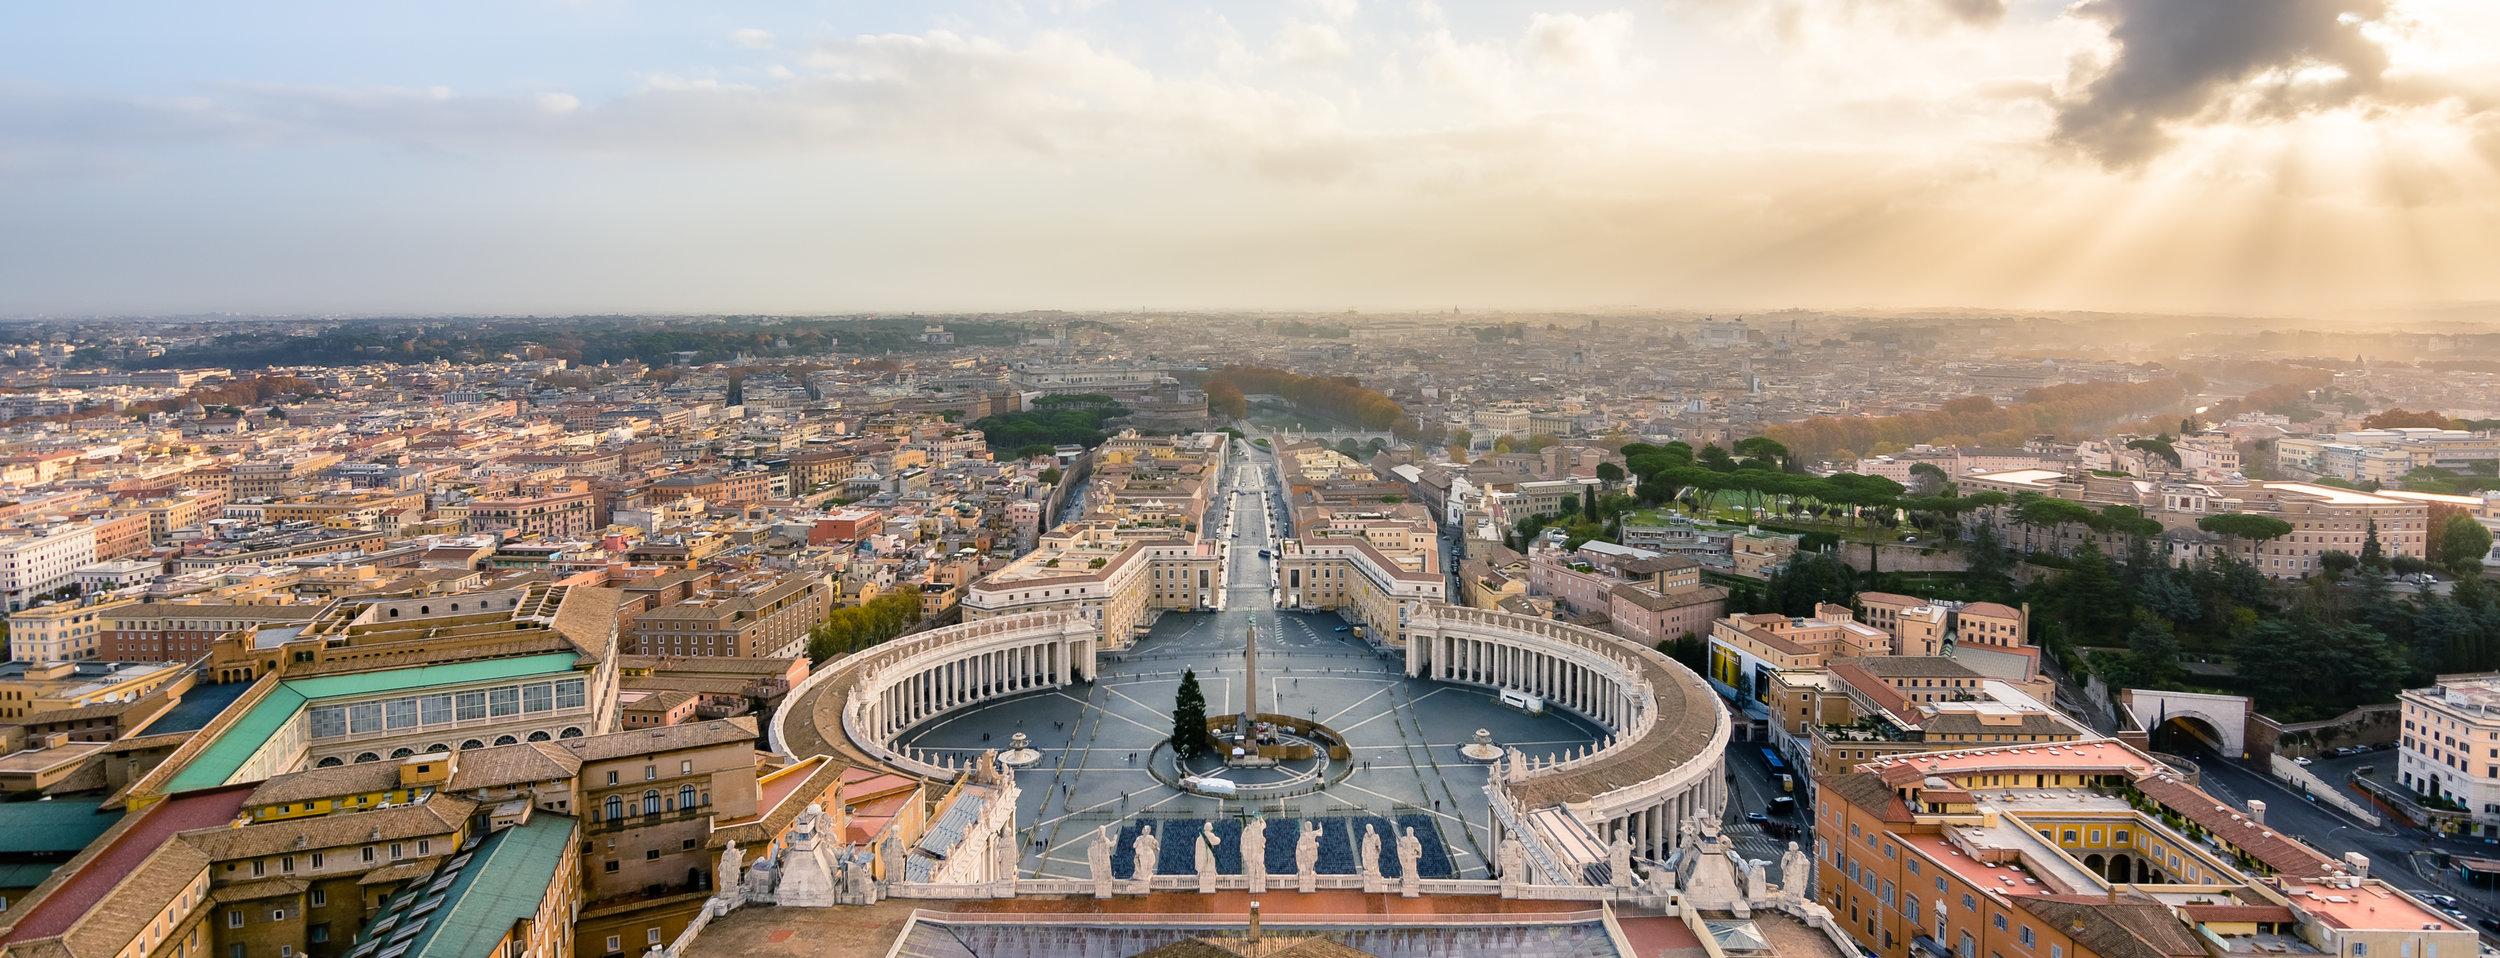 St. Peter's Basilica, Vatican City/Rome